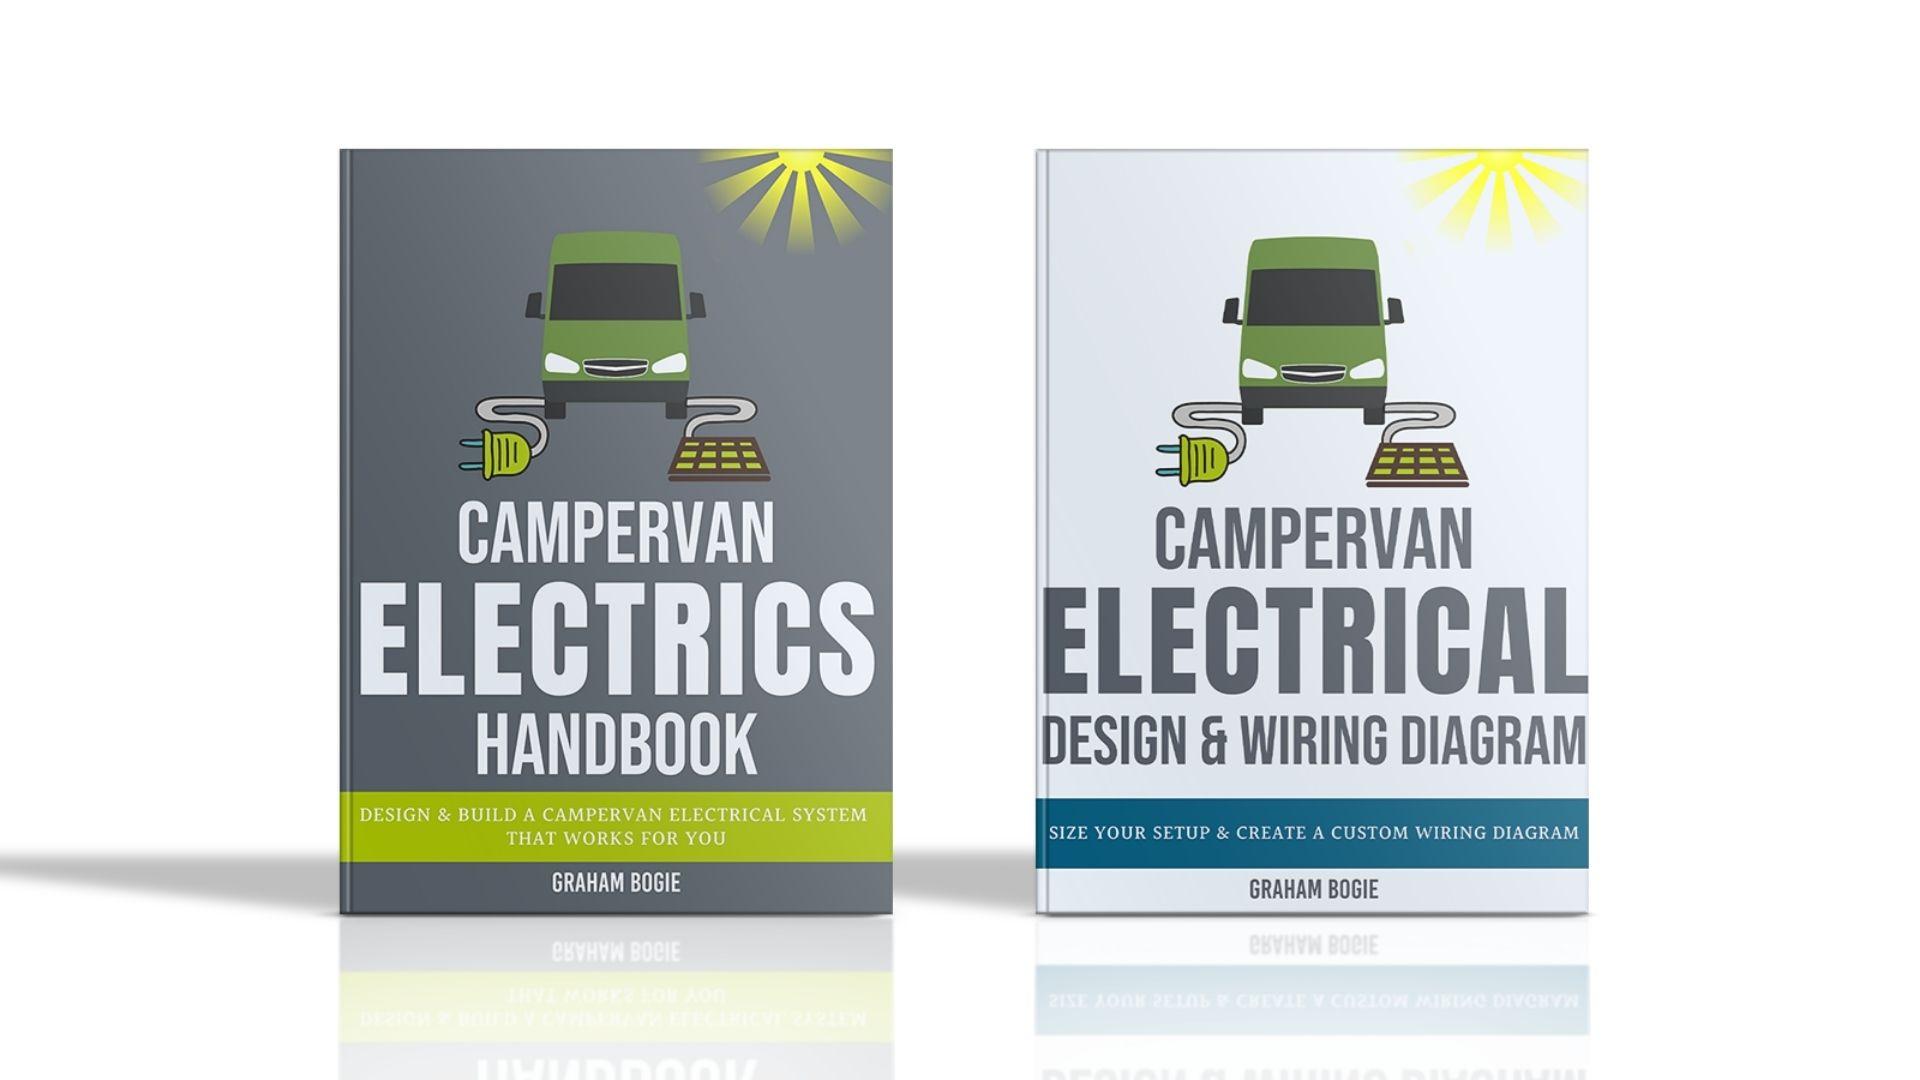 Campervan Electrics Bundle